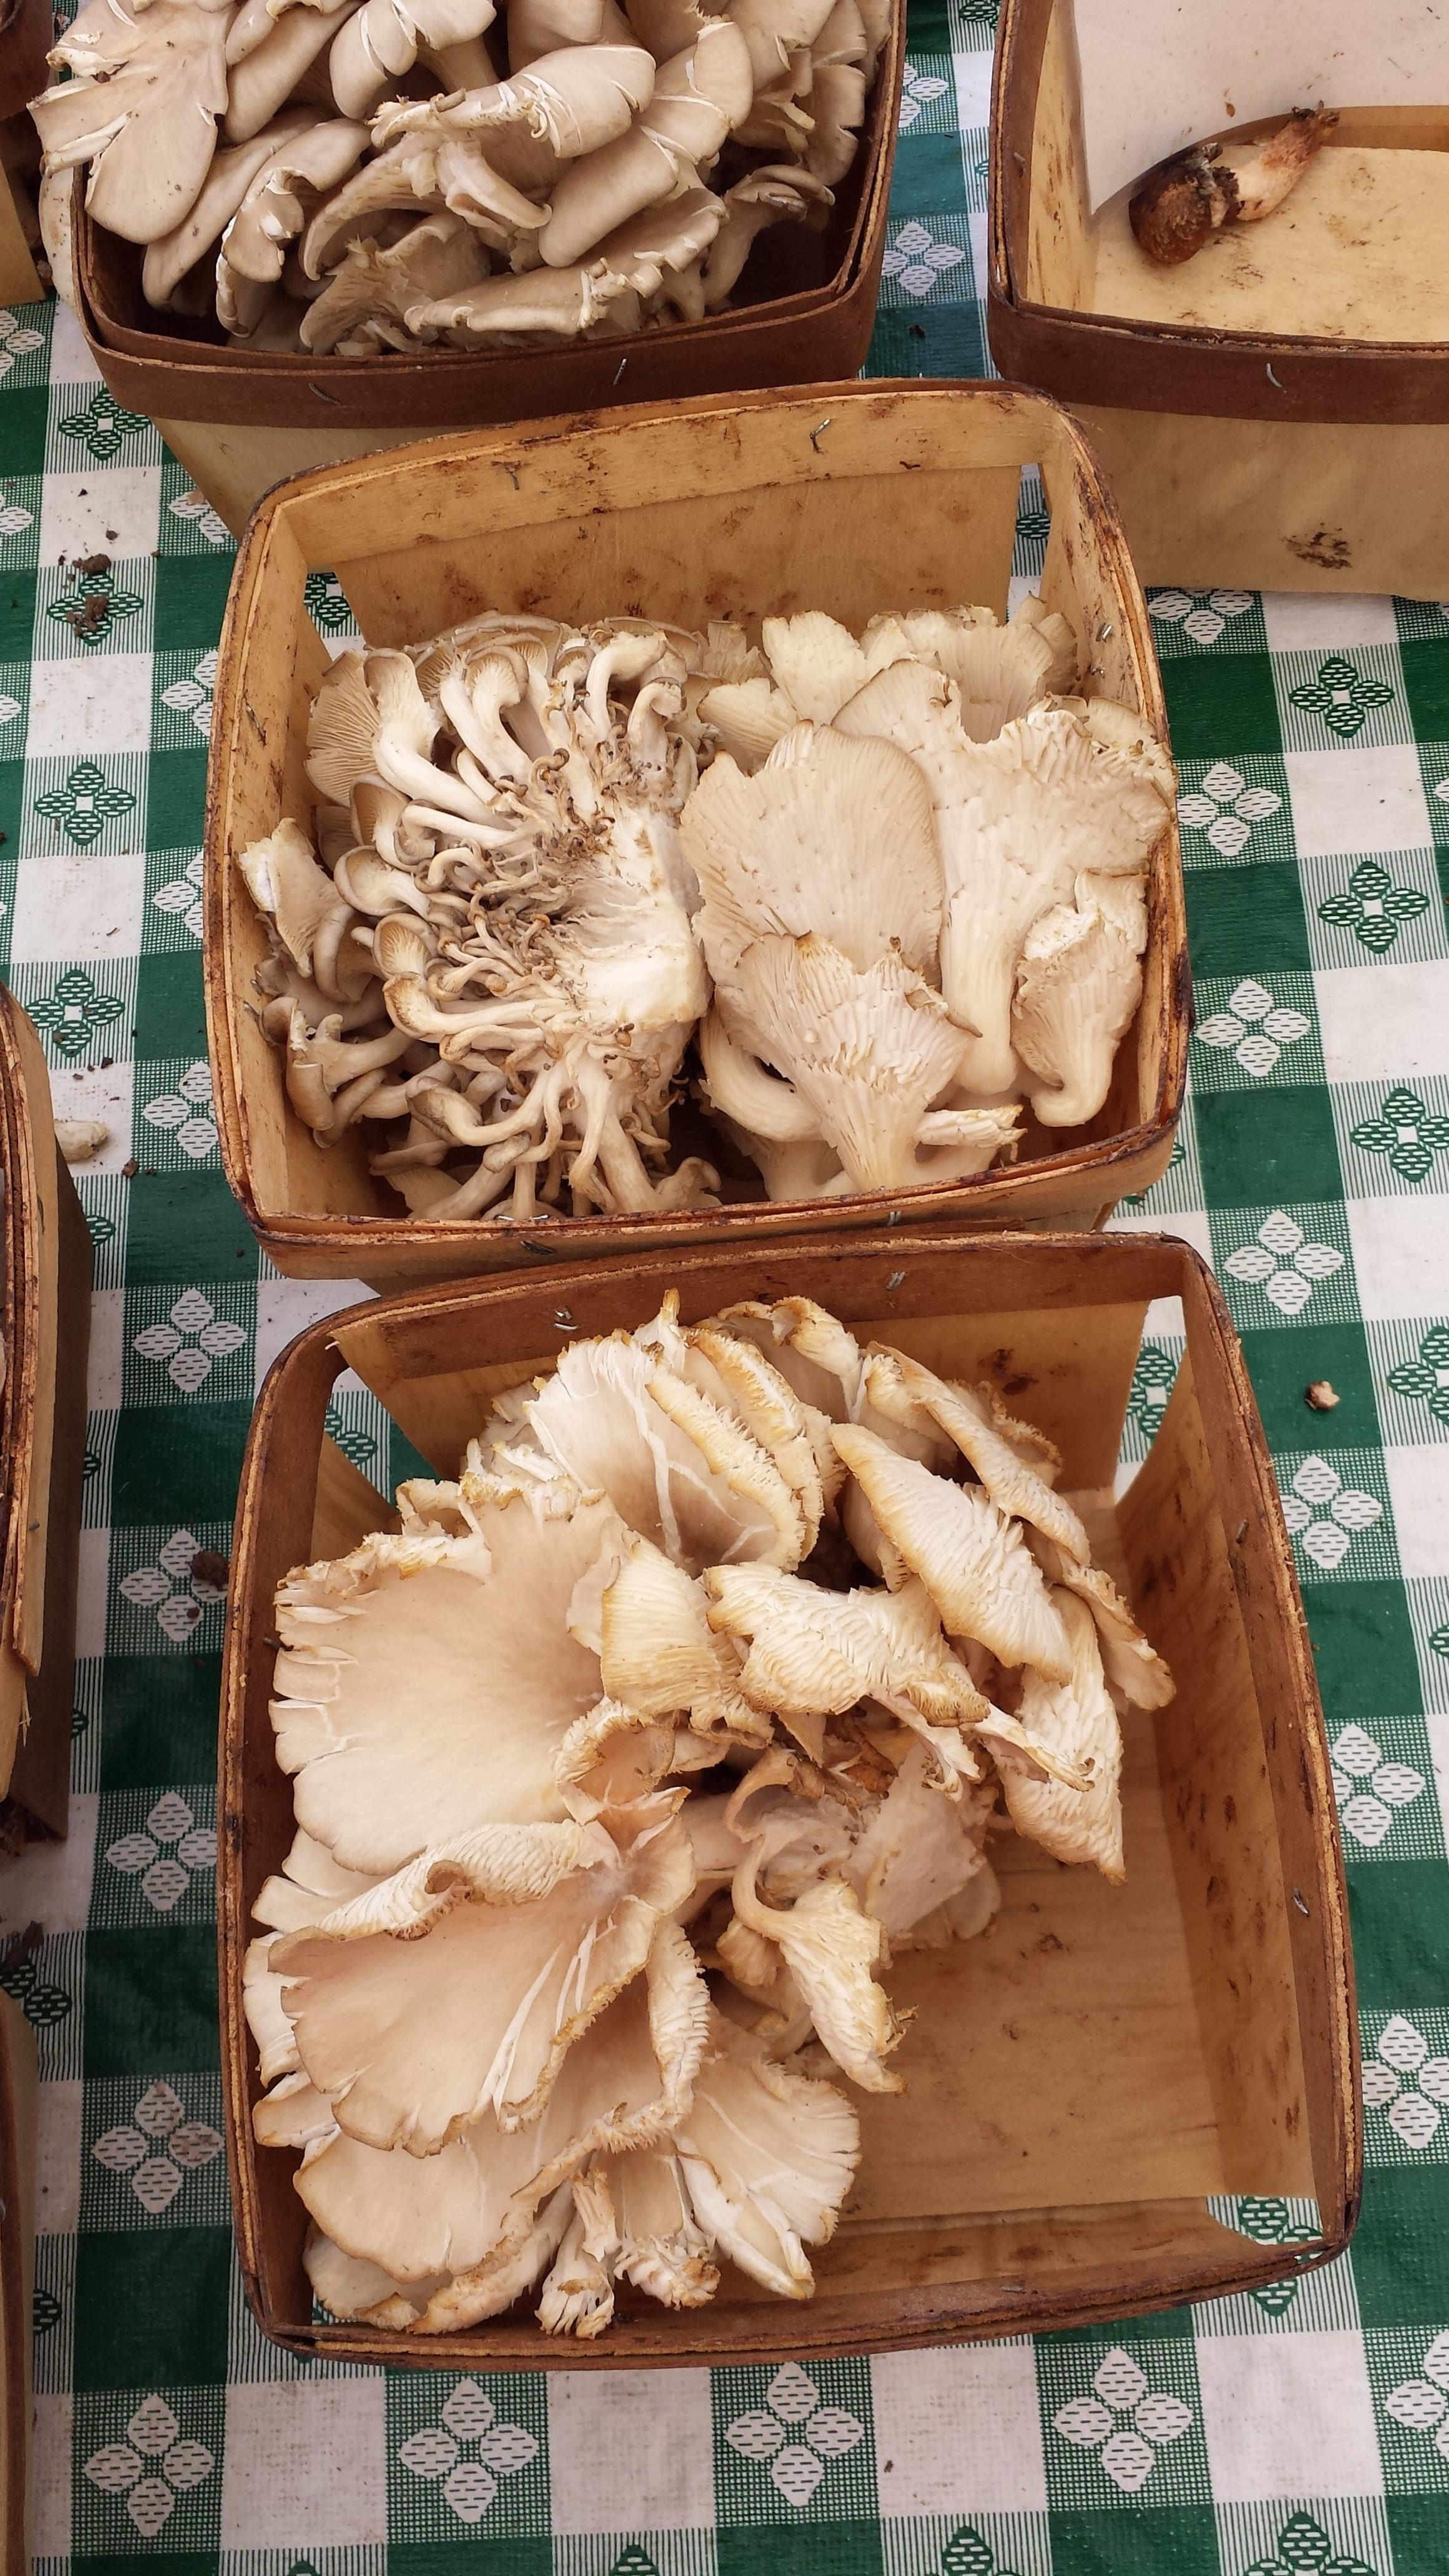 Weird mushrooms at Park Ridge farmer's market